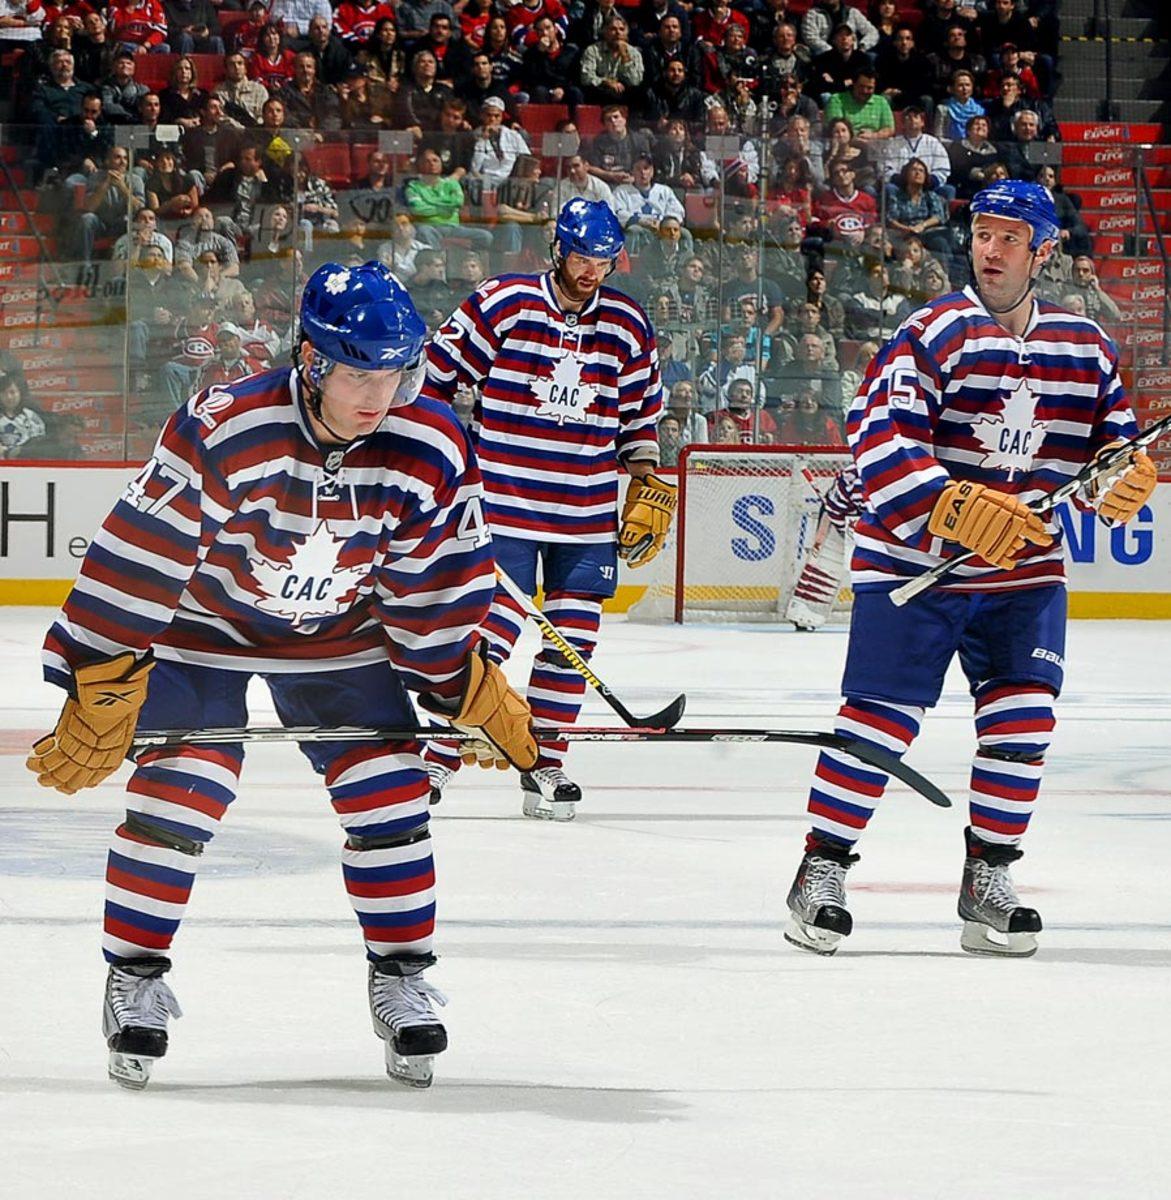 Montreal-Canadiens-uniforms-2009.jpg